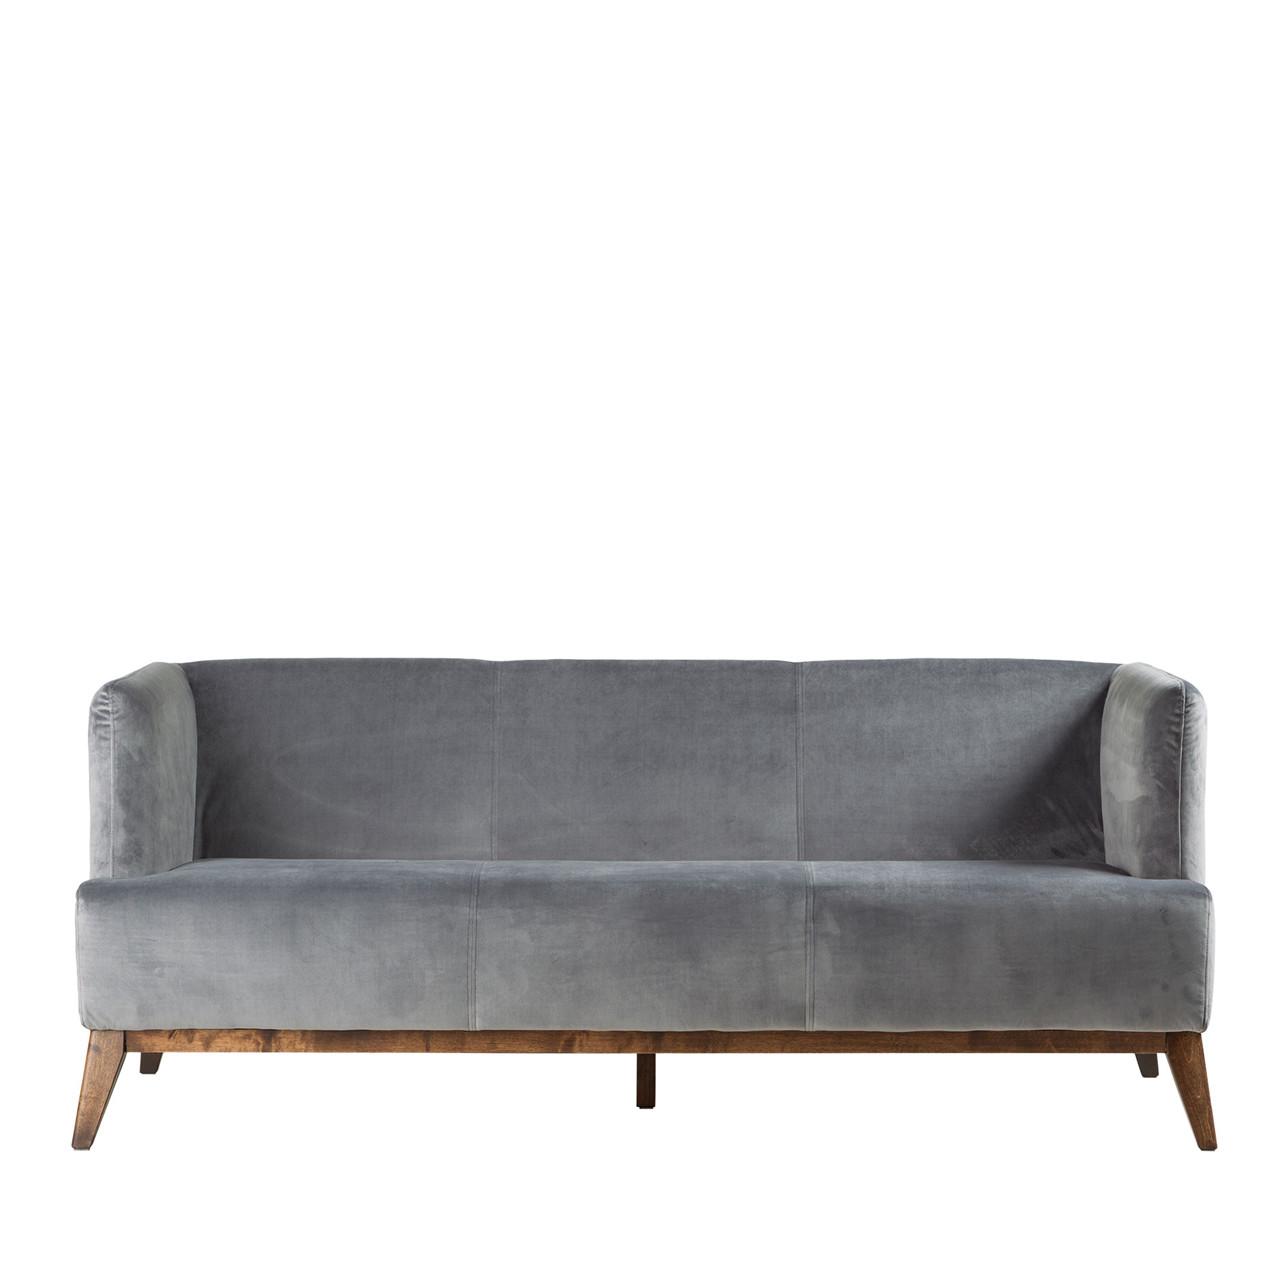 Super VIENNA velour sofa grå #LK-97